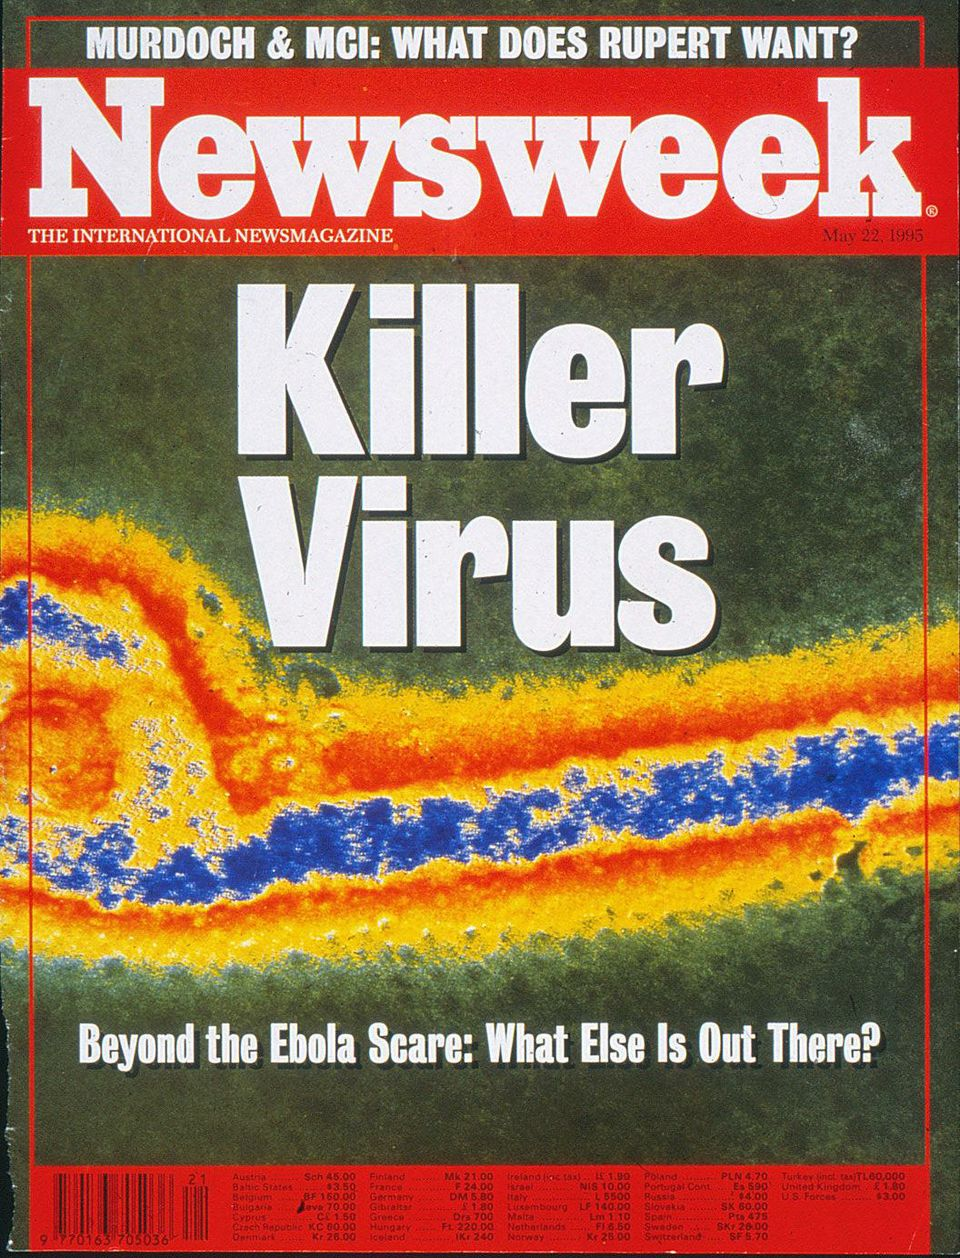 Newsweek headline declared KILLER VIRUS.